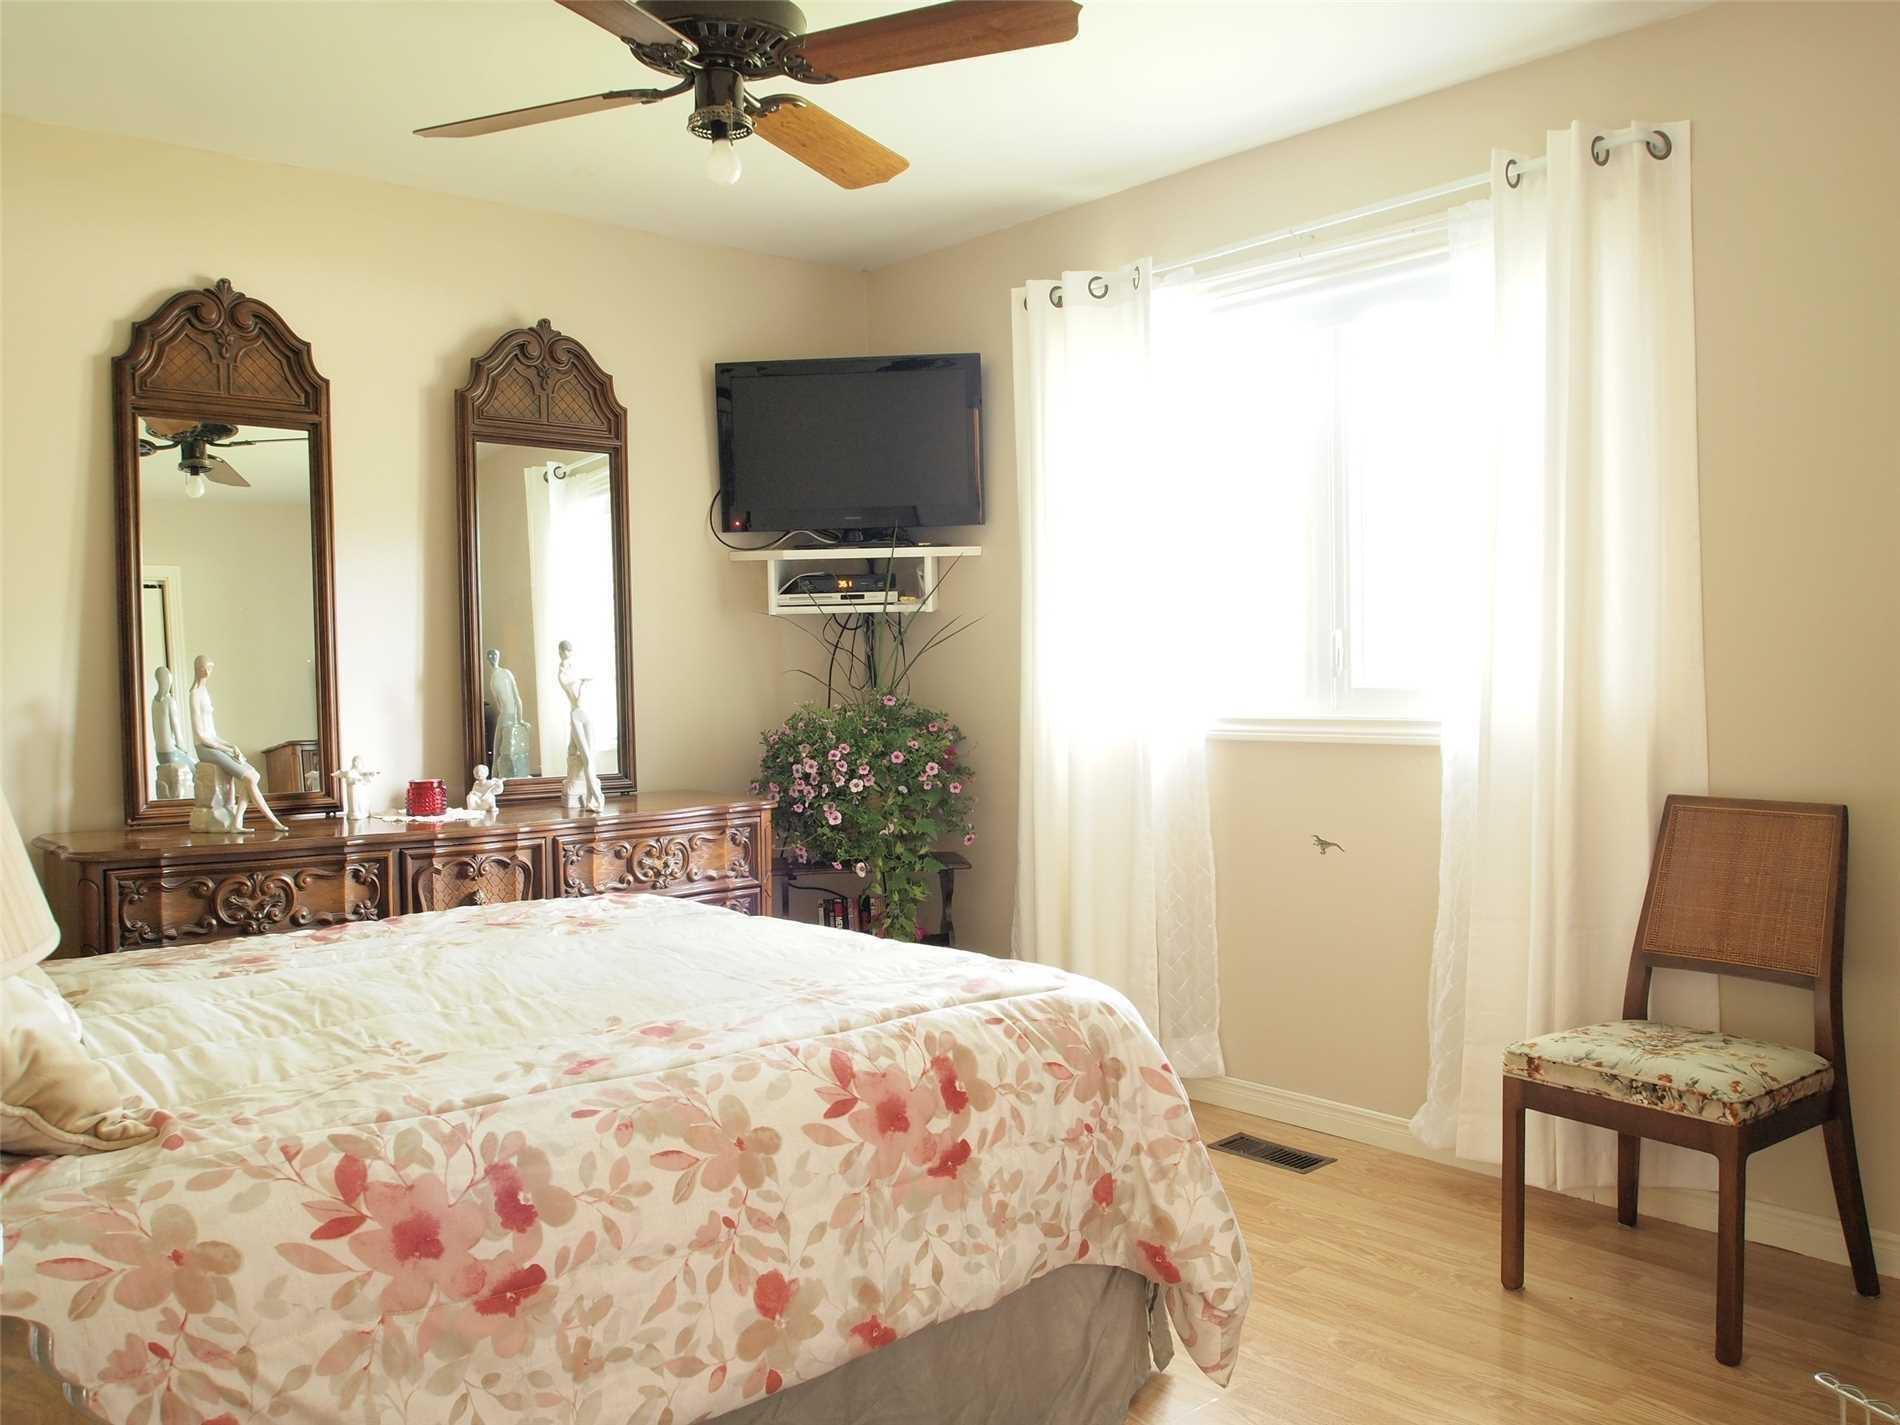 Photo 14: Photos: 105 Fifth Street in Brock: Beaverton House (Bungalow) for sale : MLS®# N4564596